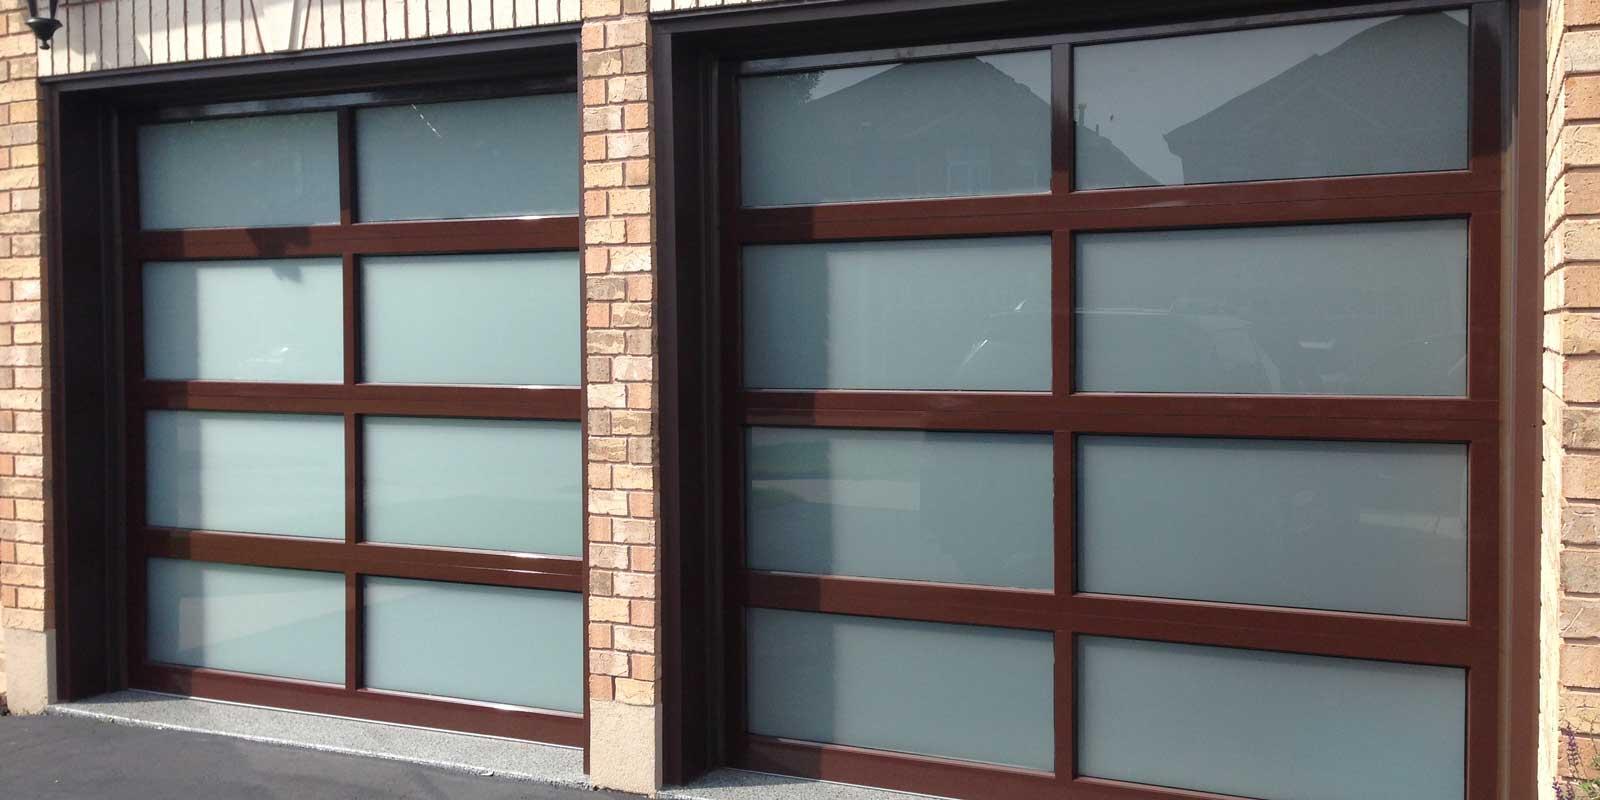 800 #976334 Toronto Garage Doors Company Providing Garage Doors Installation In  image Garage Doors Company 35831600